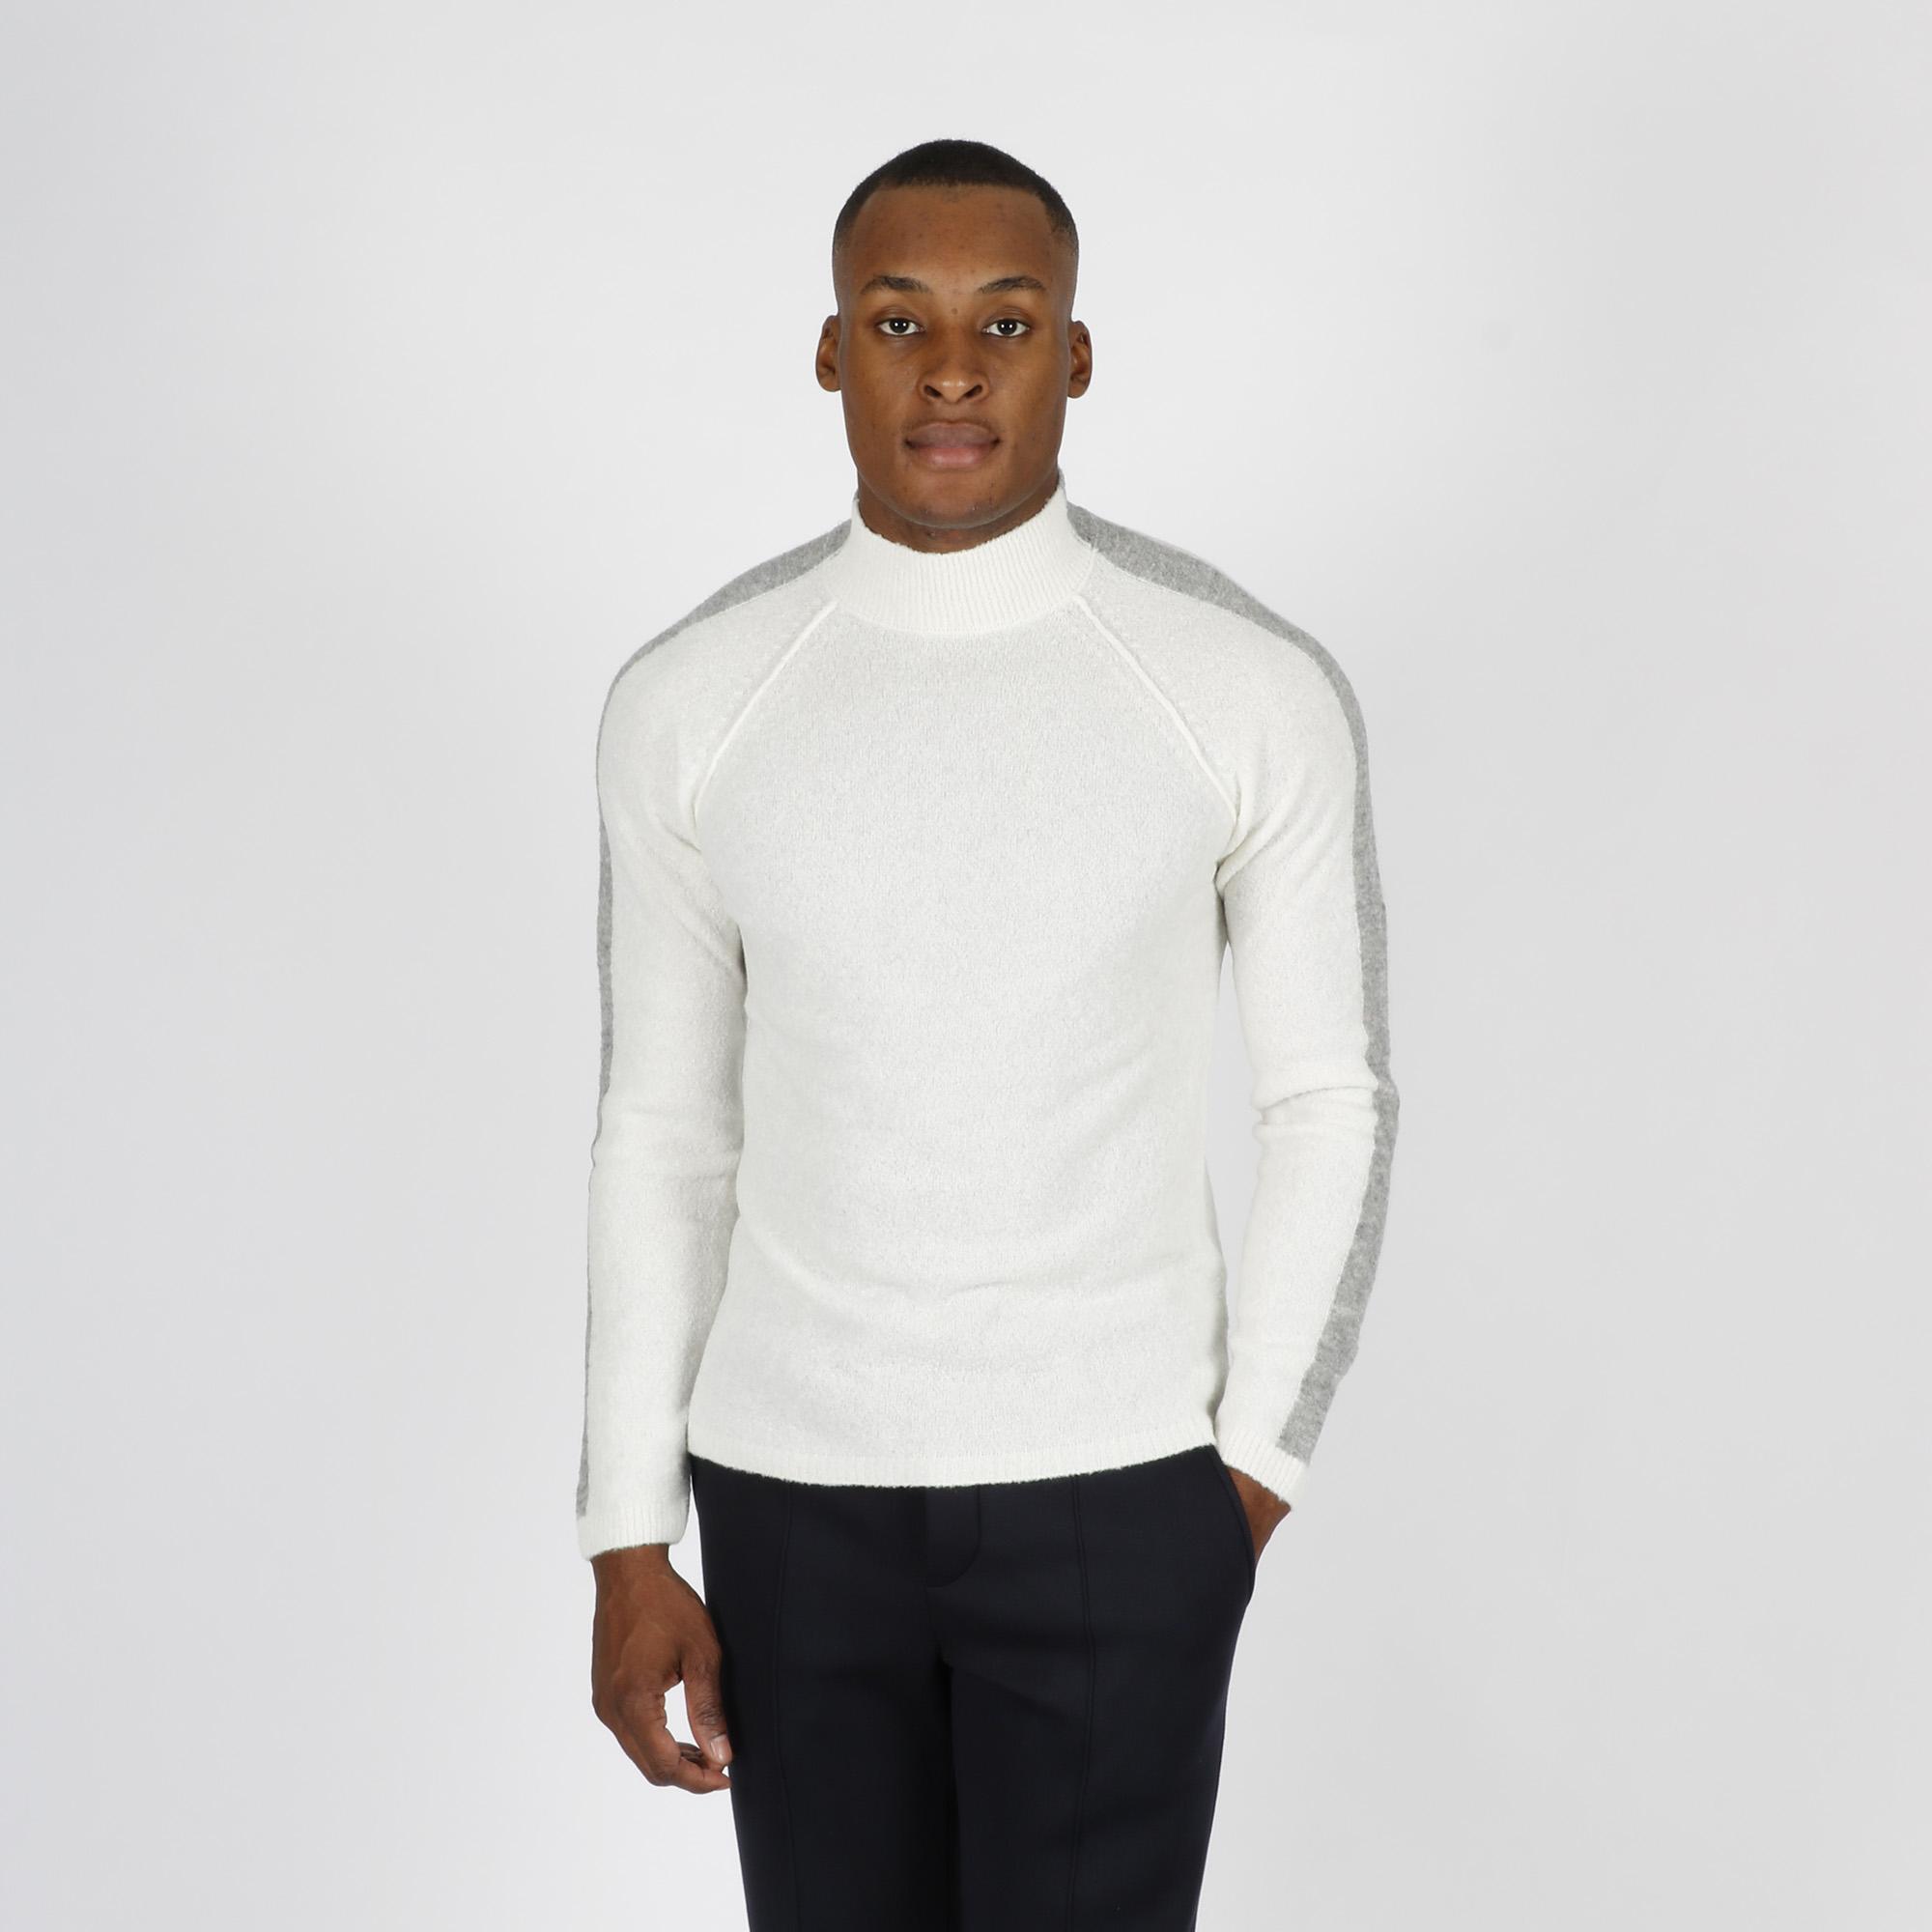 Lupo banda manica - Bianco/grigio